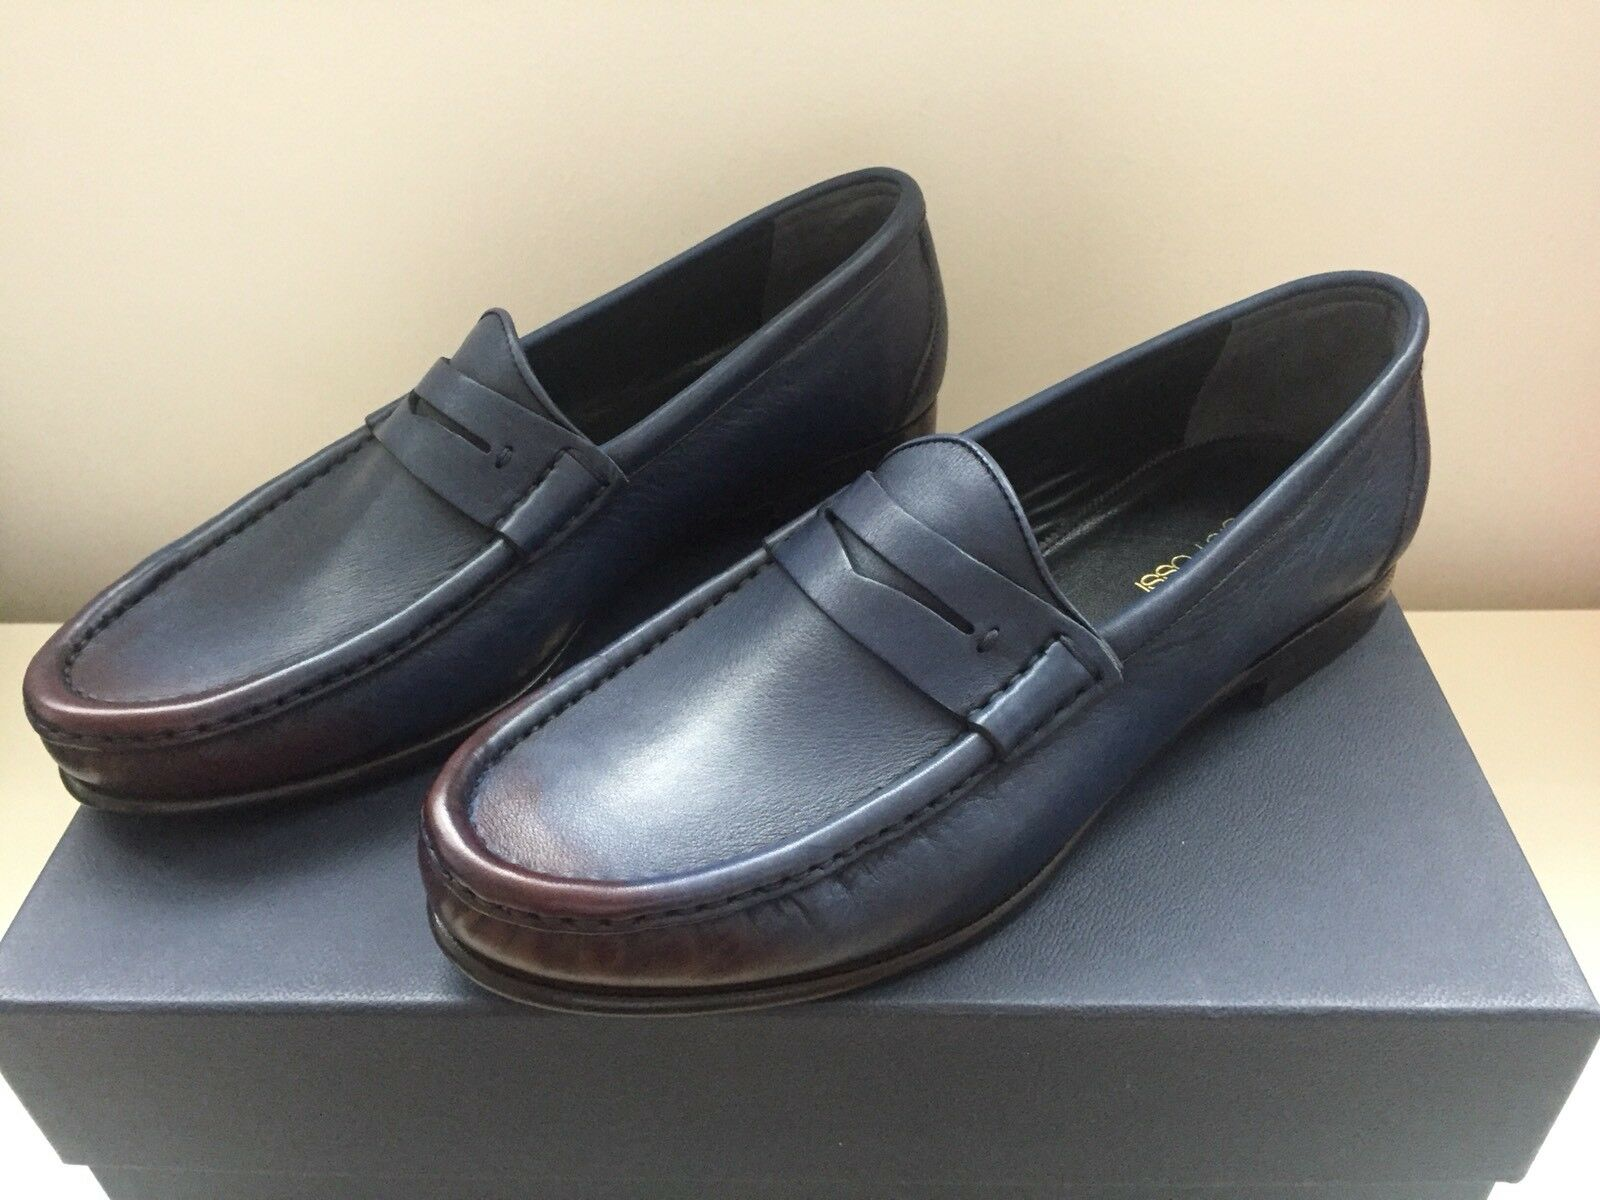 SERGIO ROSSI verde Dip-Dyed scarpe di pelle mocassini maccasins 9.5-US 8.5-UK